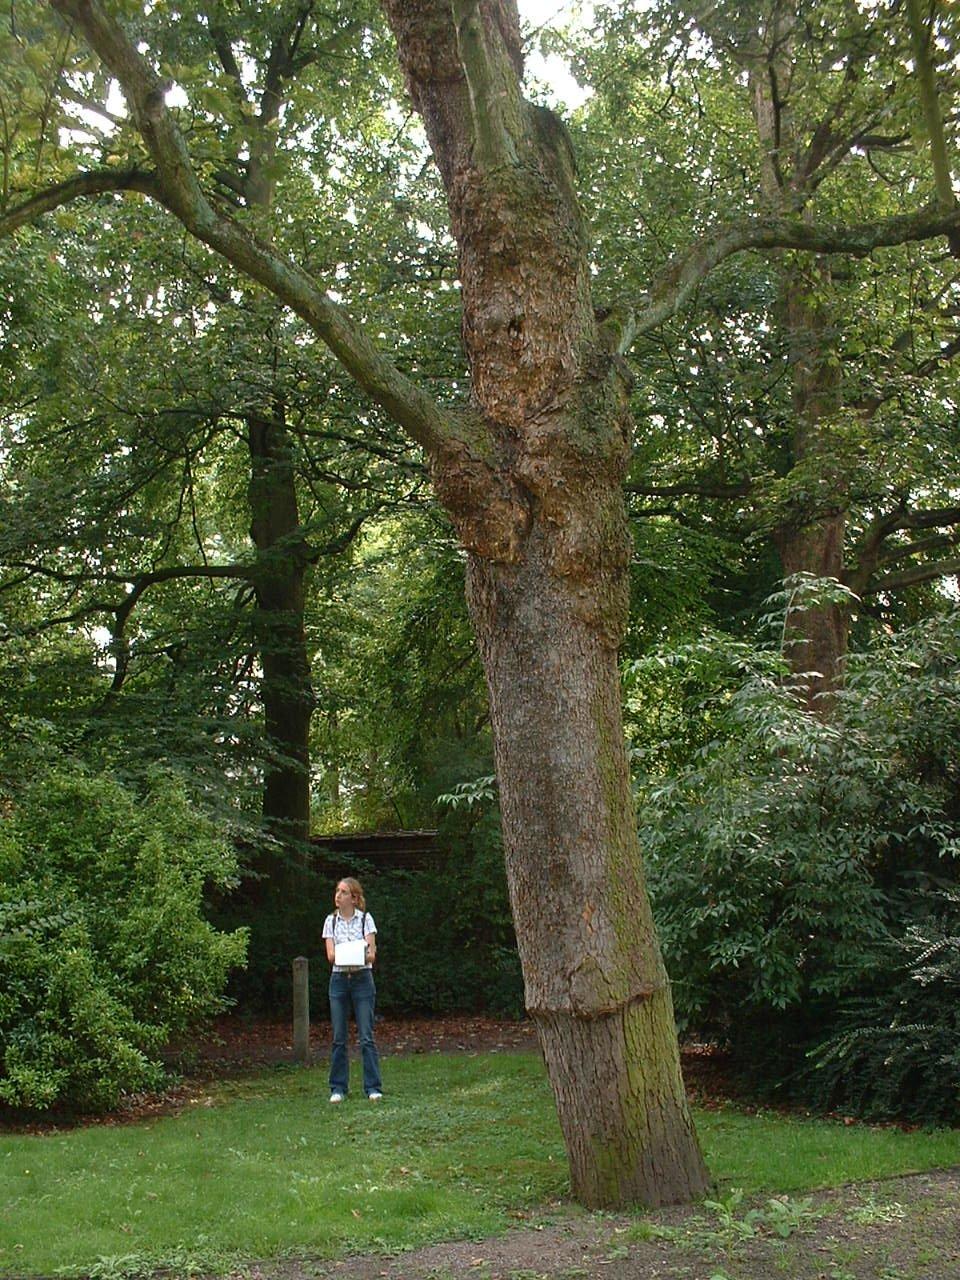 Acer pseudoplatanus f. aureovariegatum – Saint-Gilles, Avenue Brugmann, 29 –  19 Août 2002